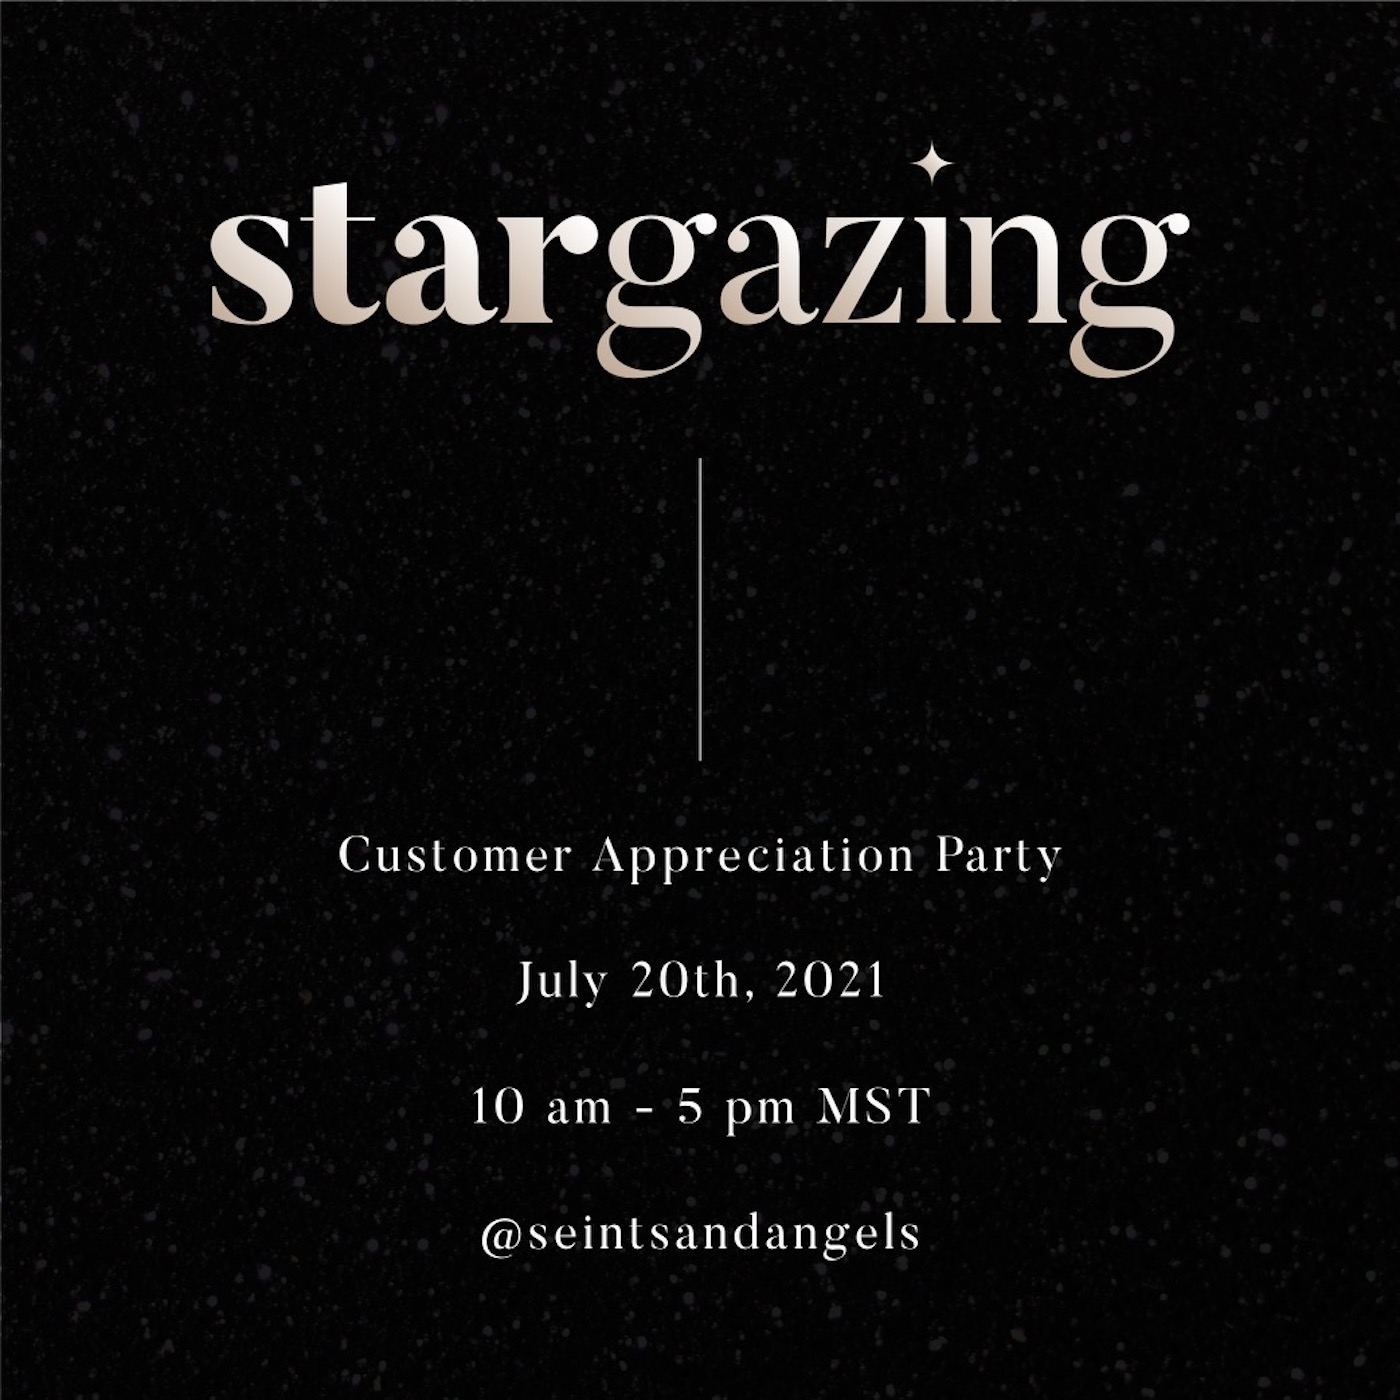 Stargazing-17